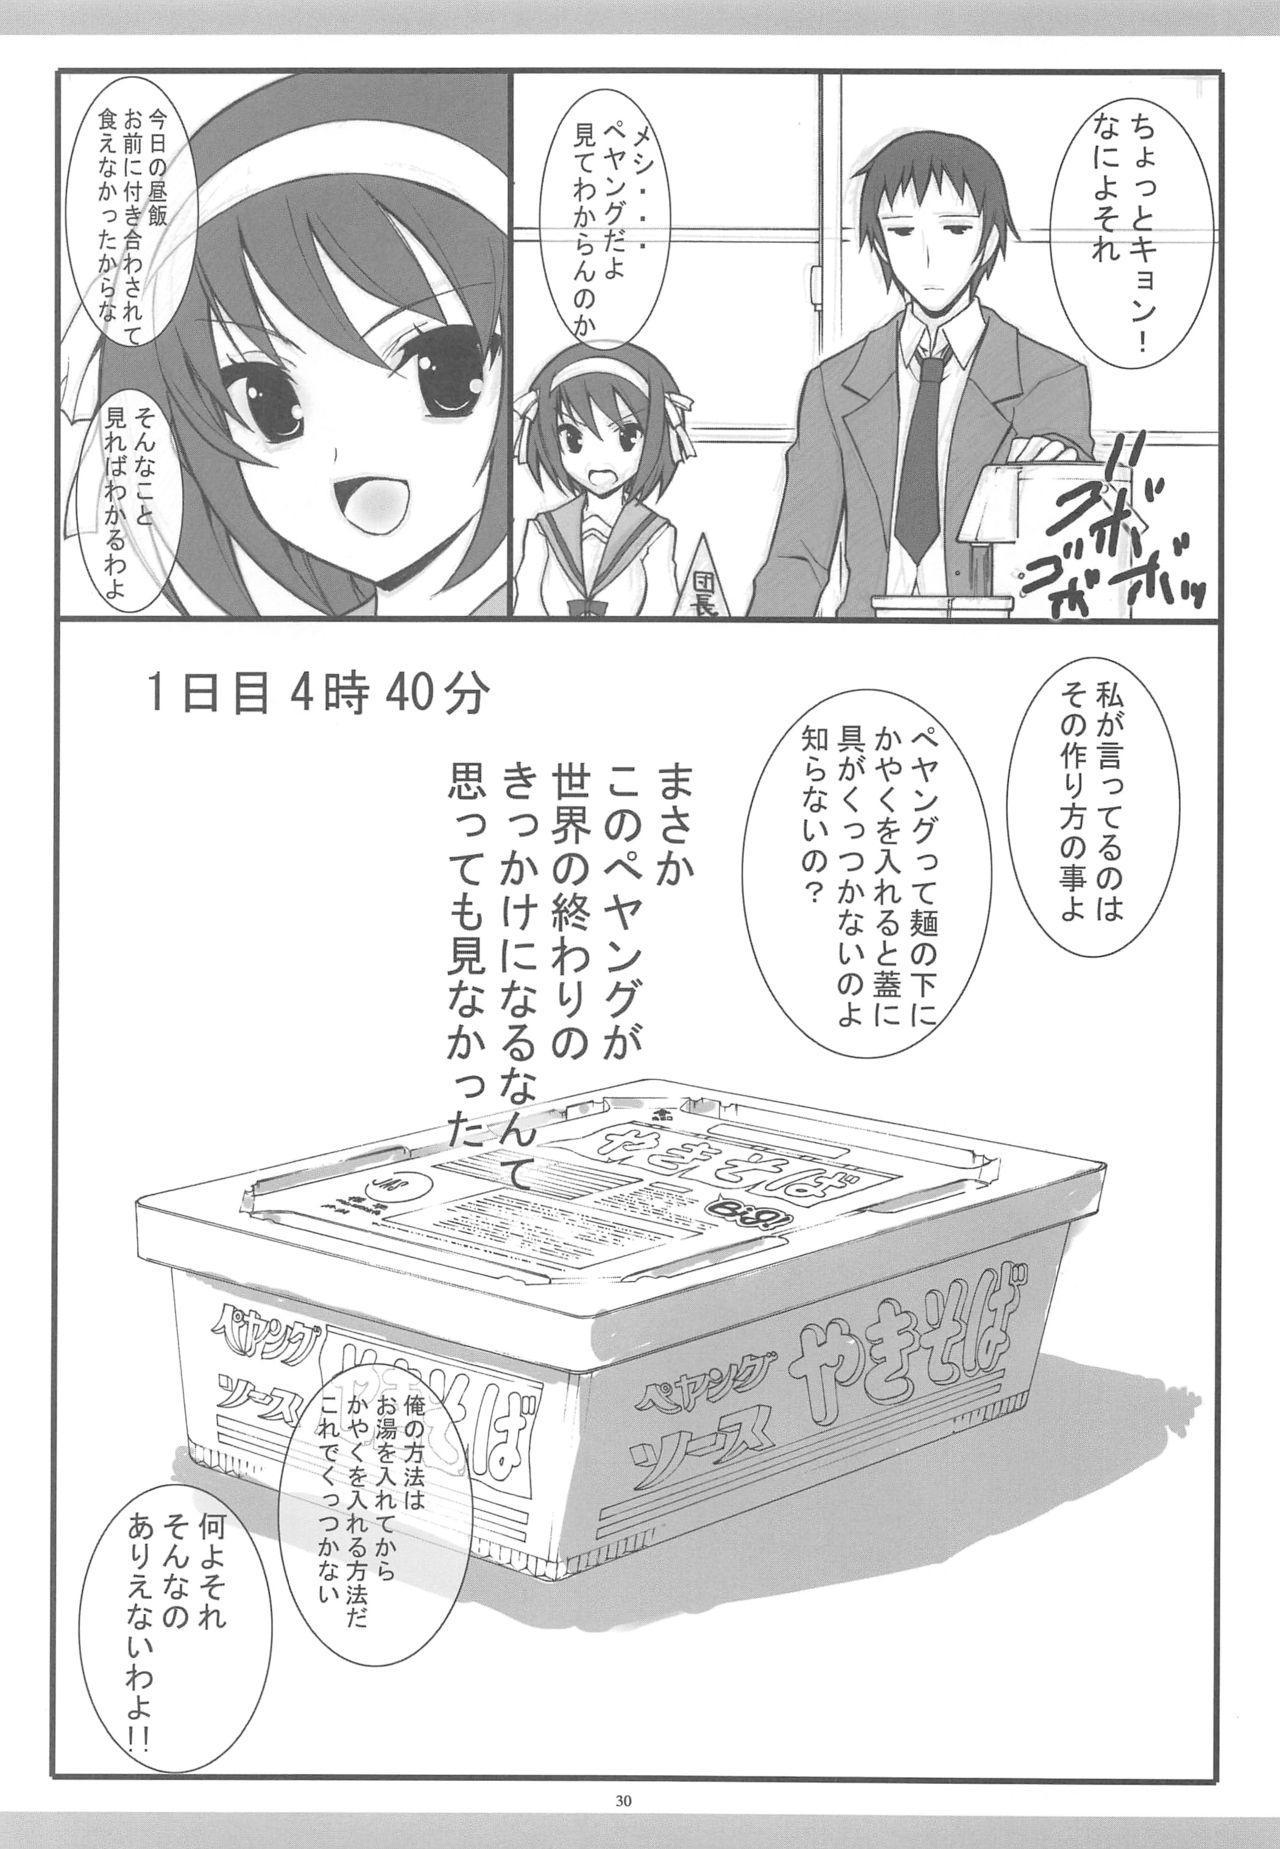 KyoAni Kaishaku KyoAni Soushuuhen 26